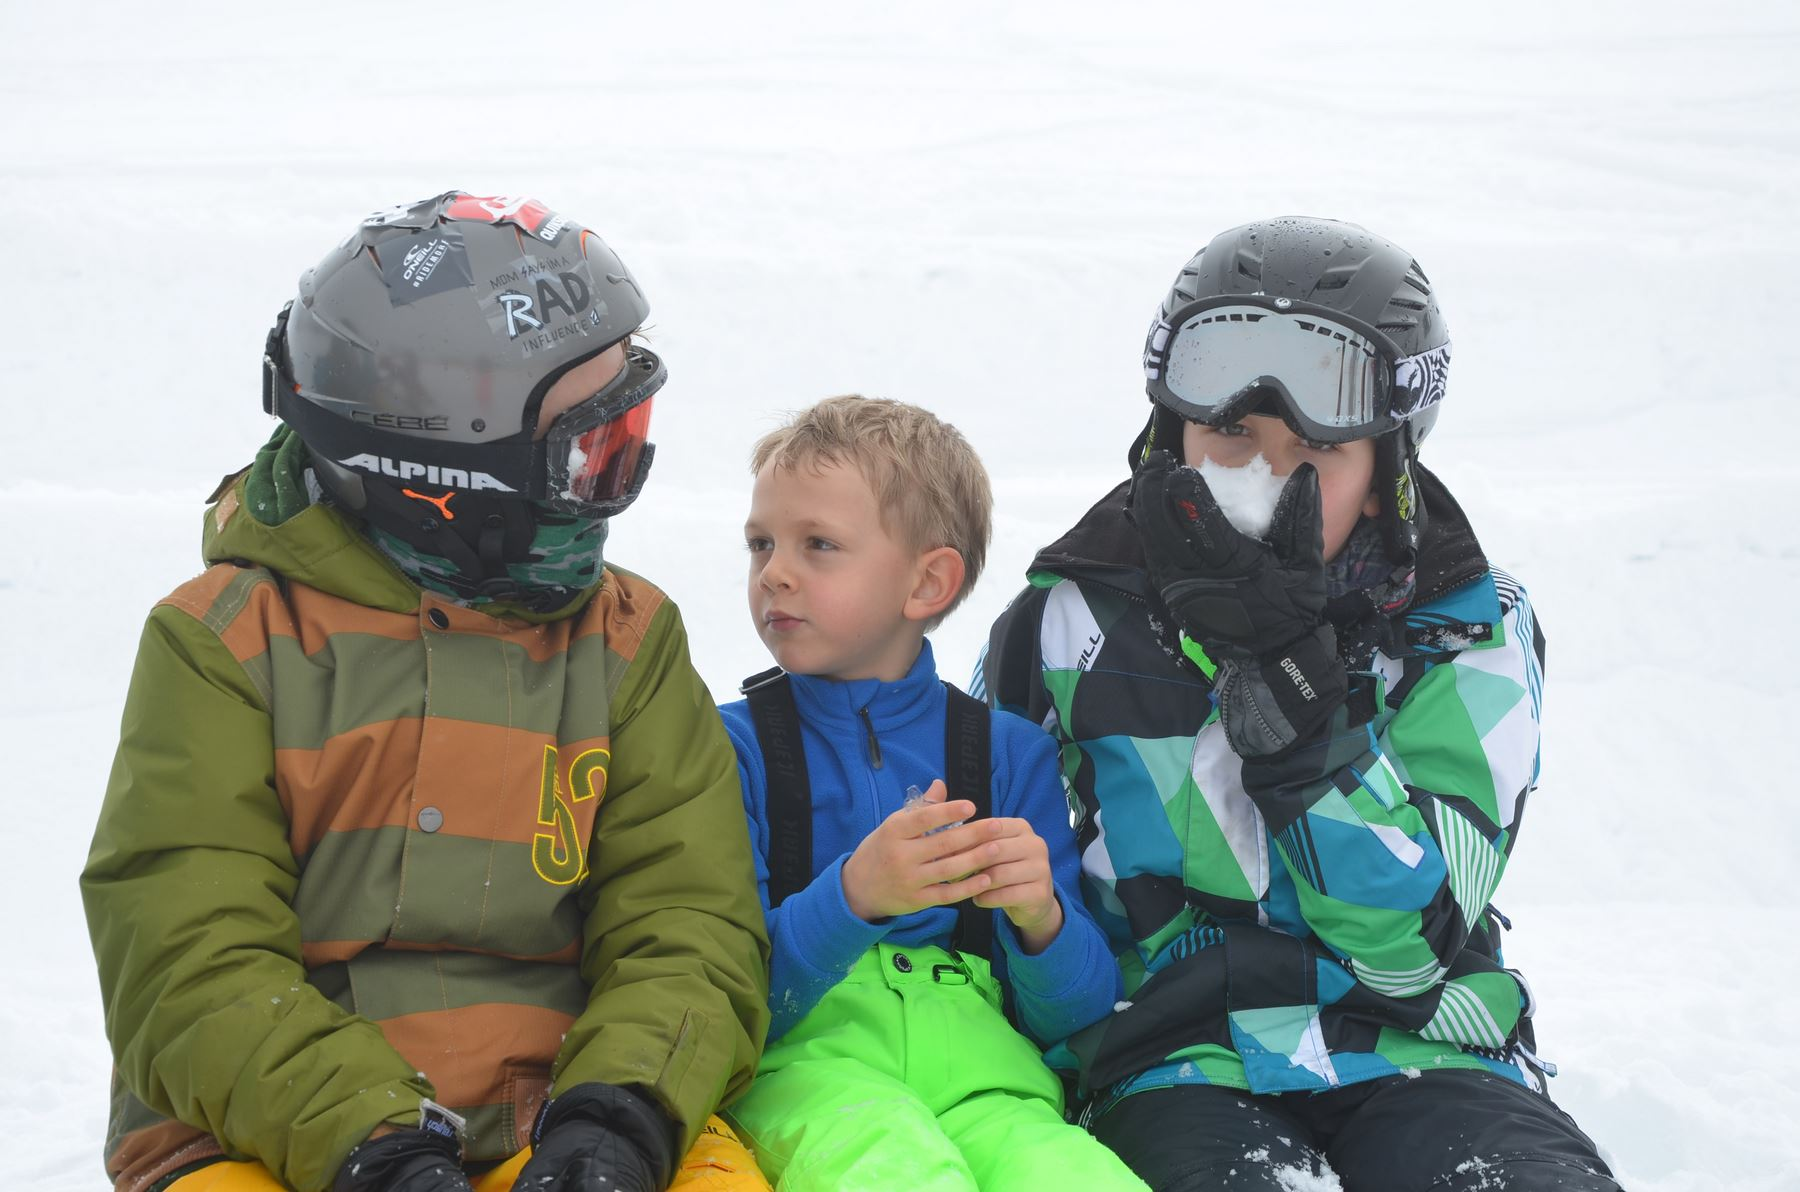 2015-03-22 BV Zillertal Skirennen 192.JPG